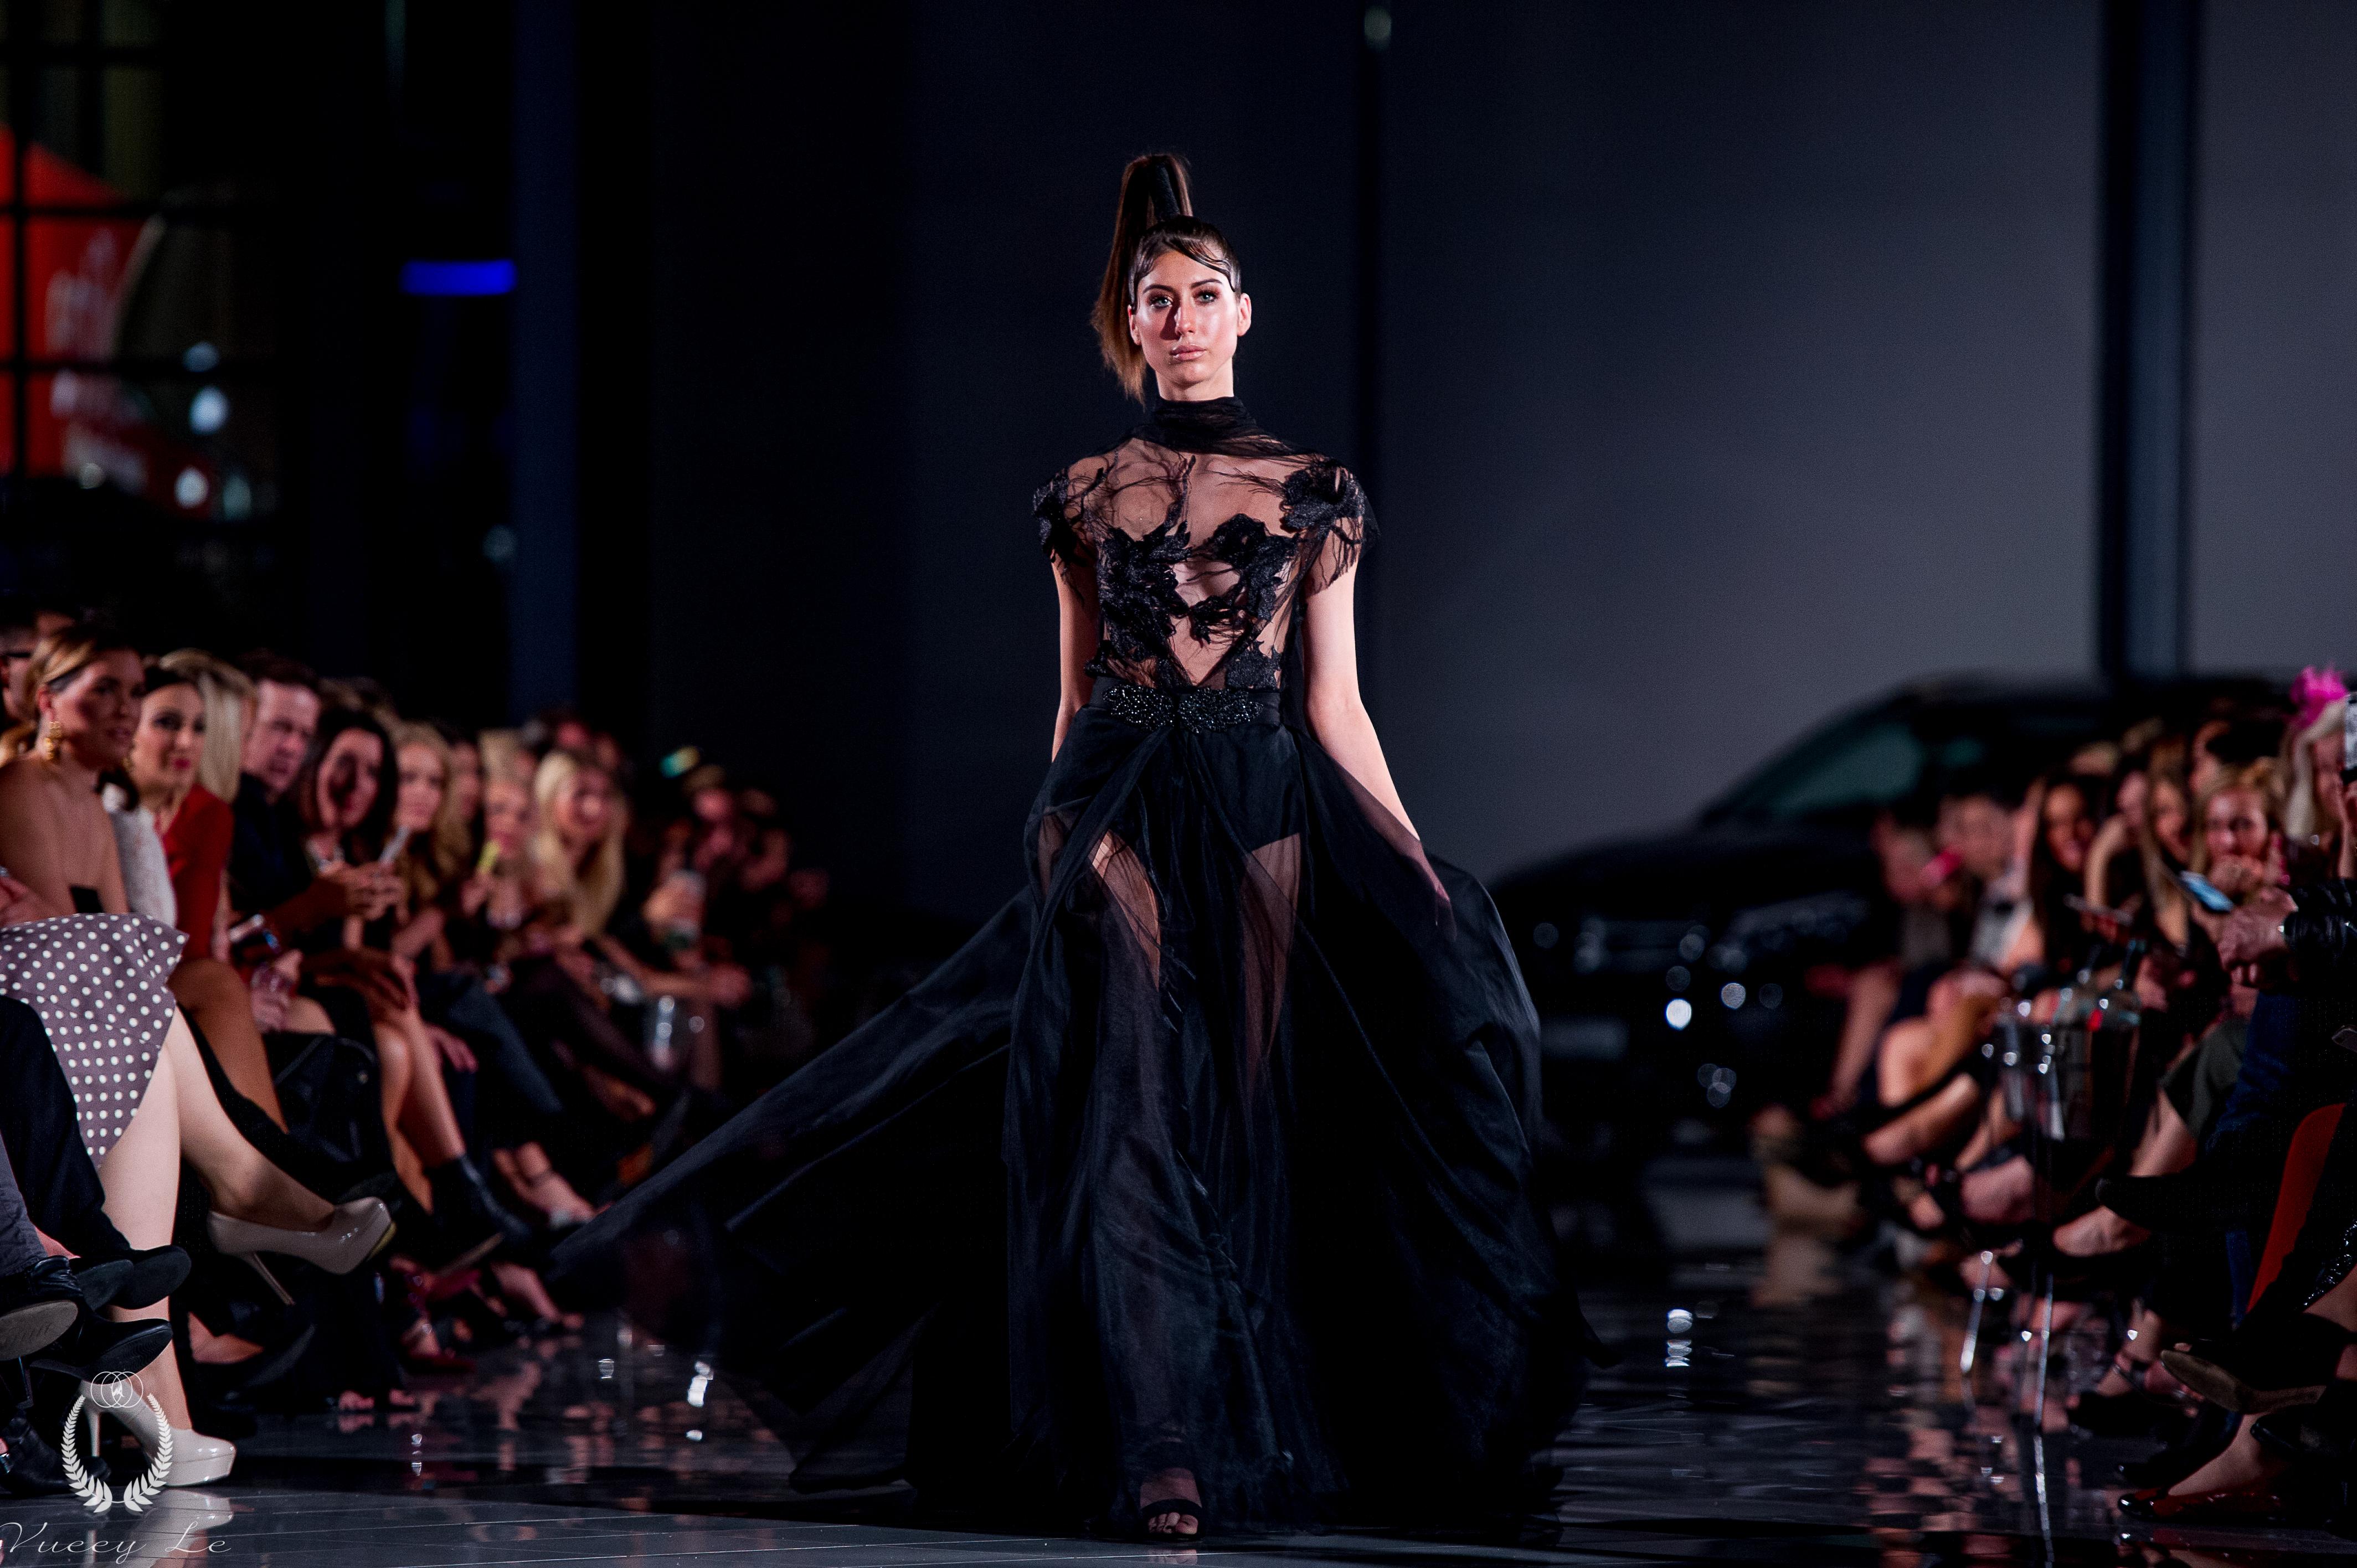 The Black Dress X Mercedes-Benz